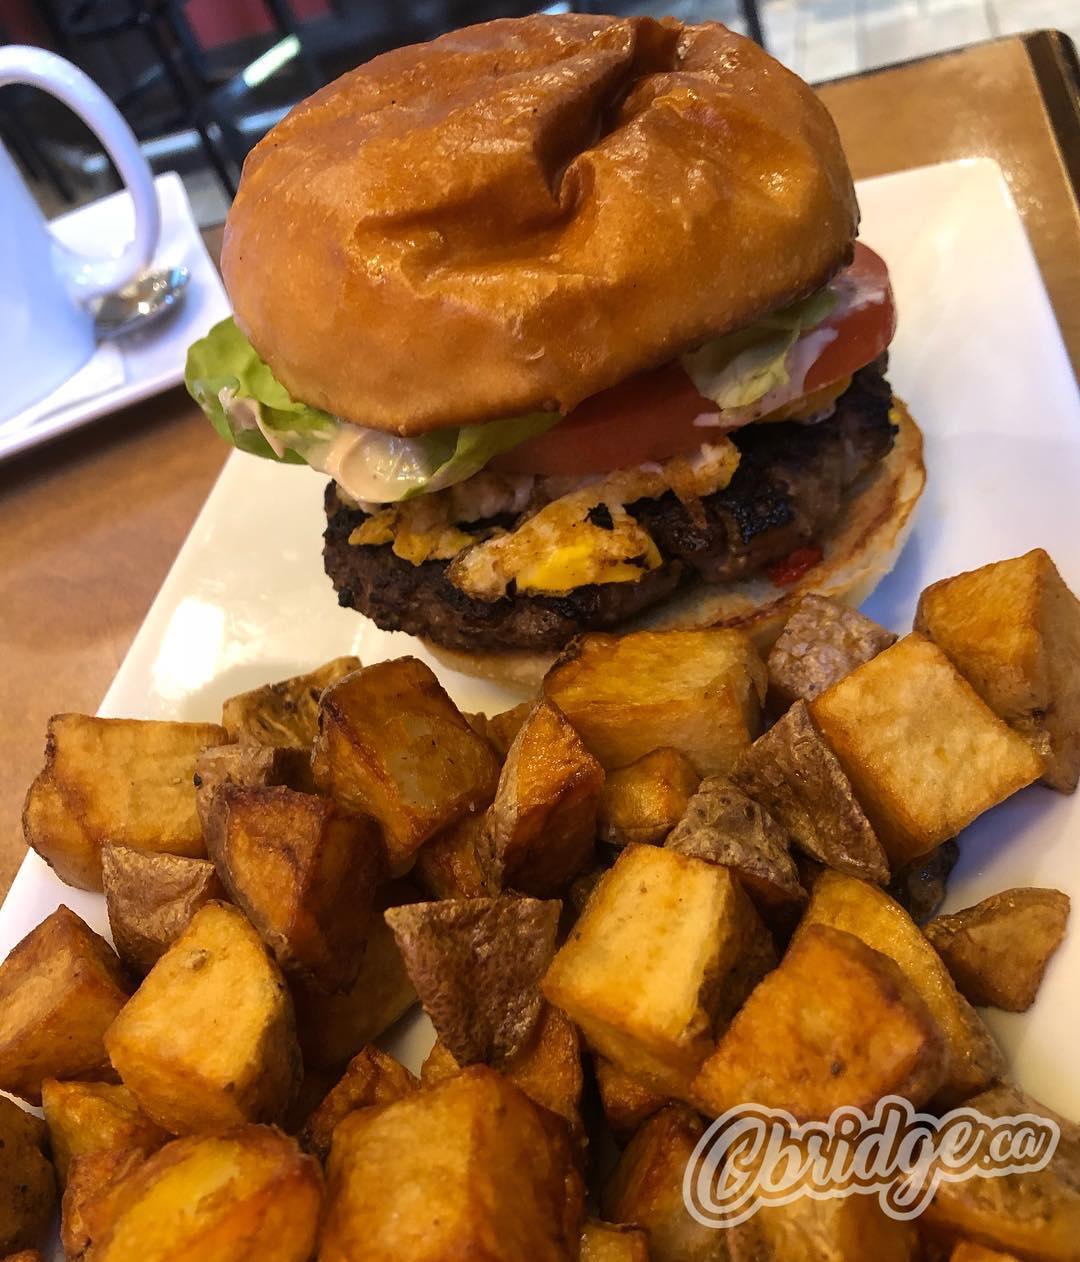 A Cure ? for brunch today from @cambridgetemplebarpub #cbridge #mycbridge #hangovercure